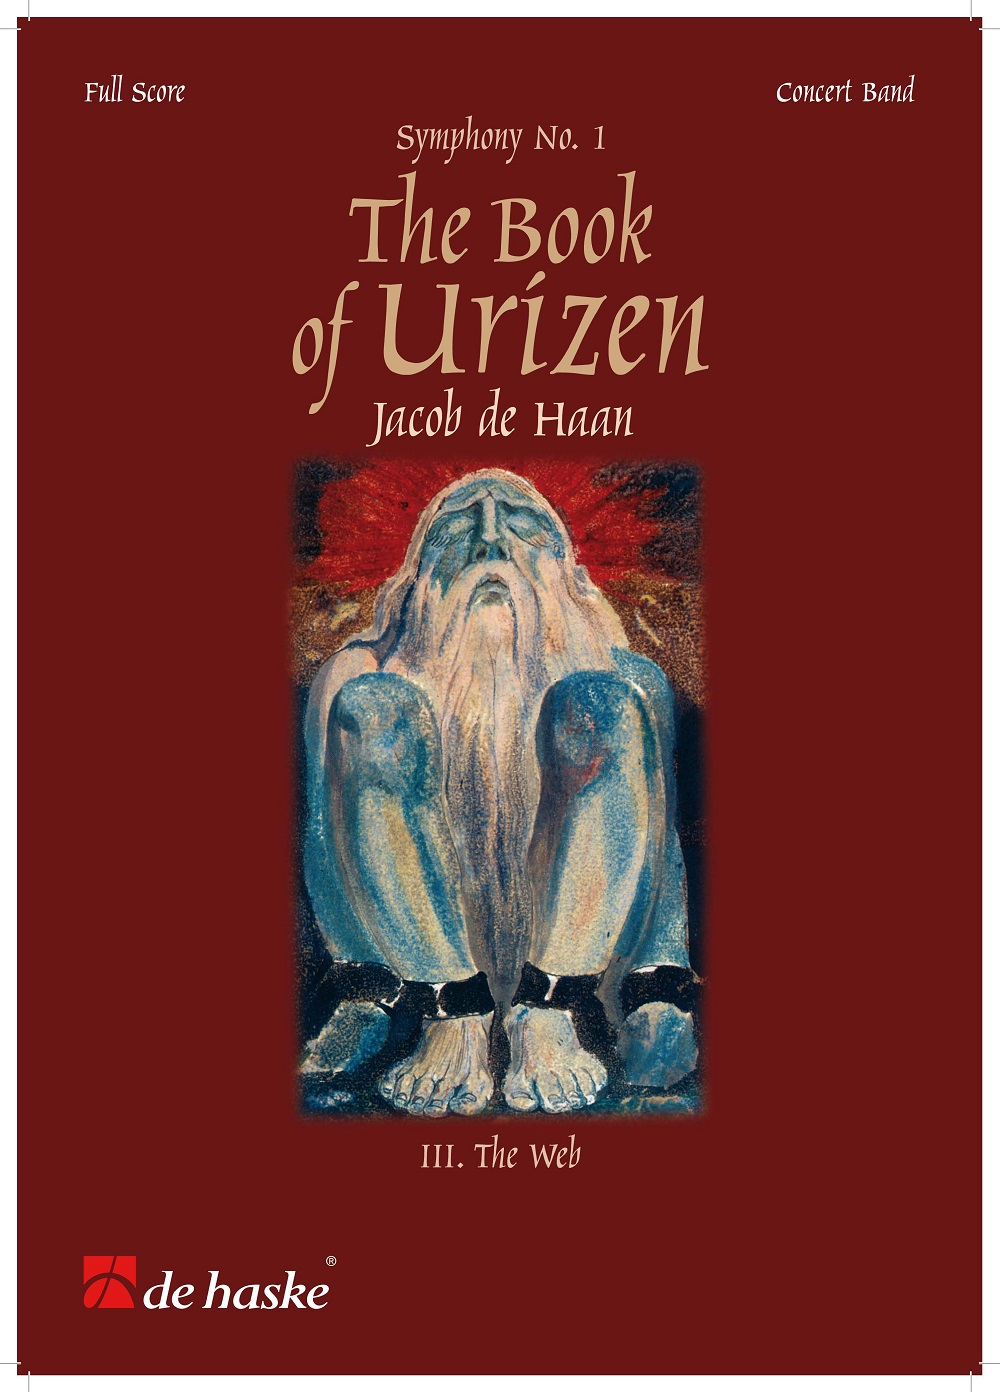 Jacob de Haan: The Book of Urizen - Symphony No. 1: Concert Band: Score and